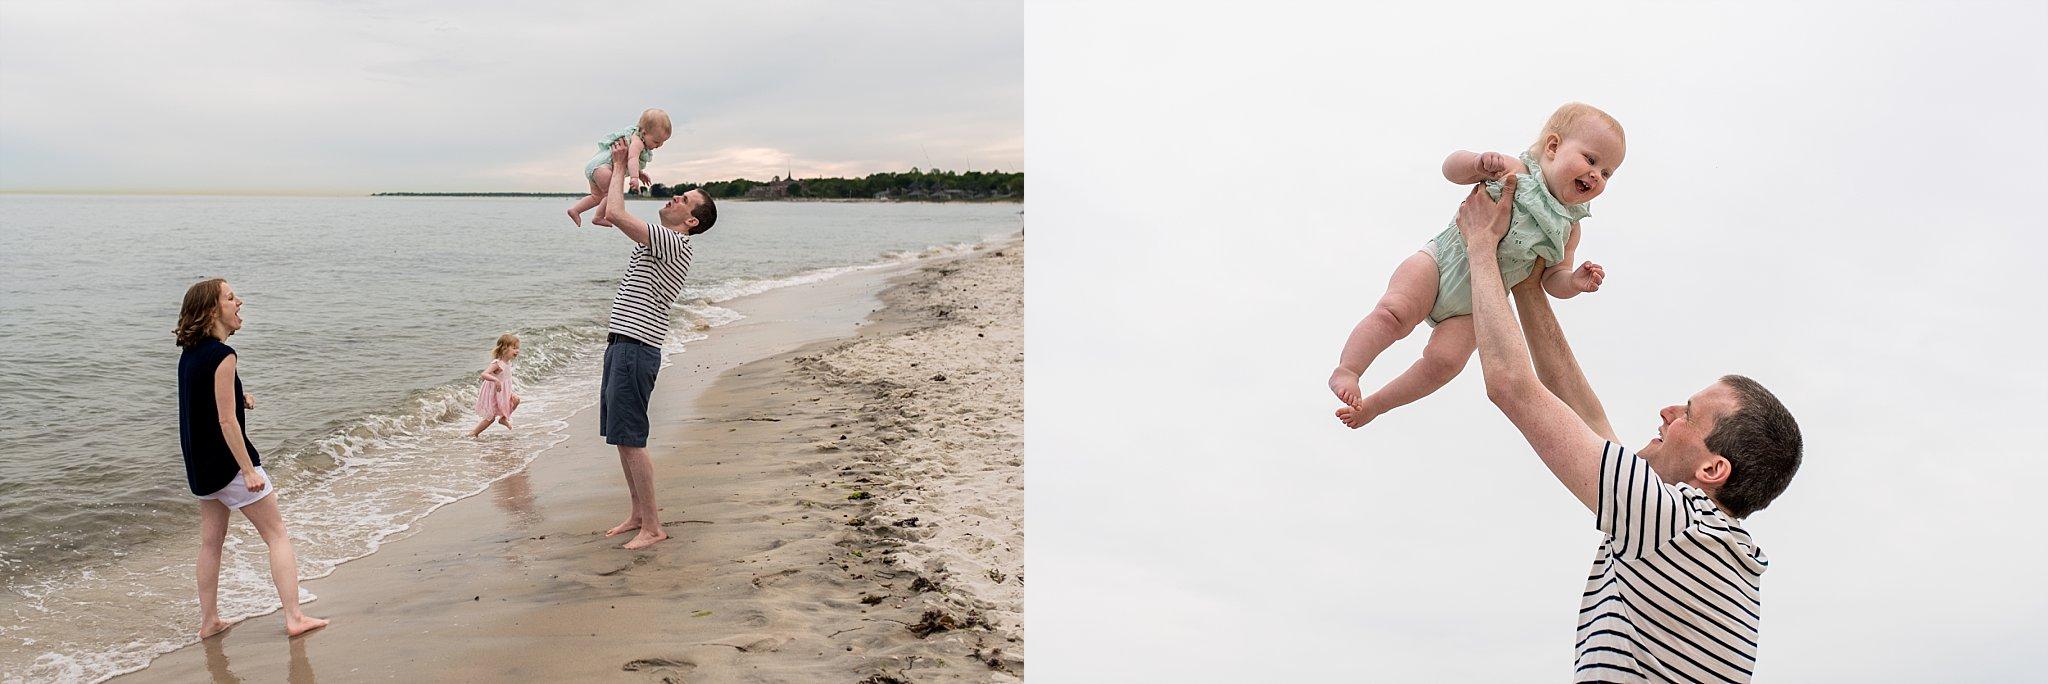 ct beach photographer